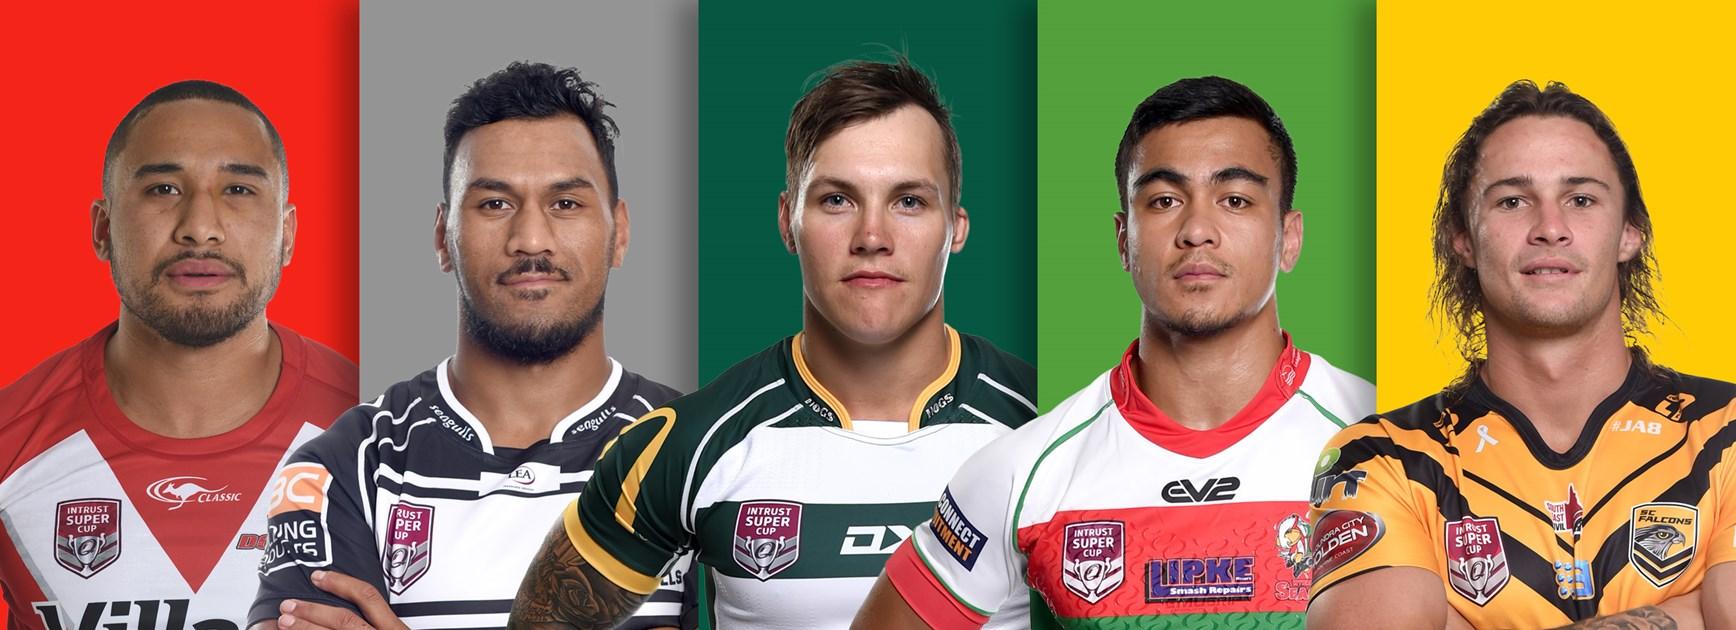 Intrust Super Cup's future NRL stars revealed